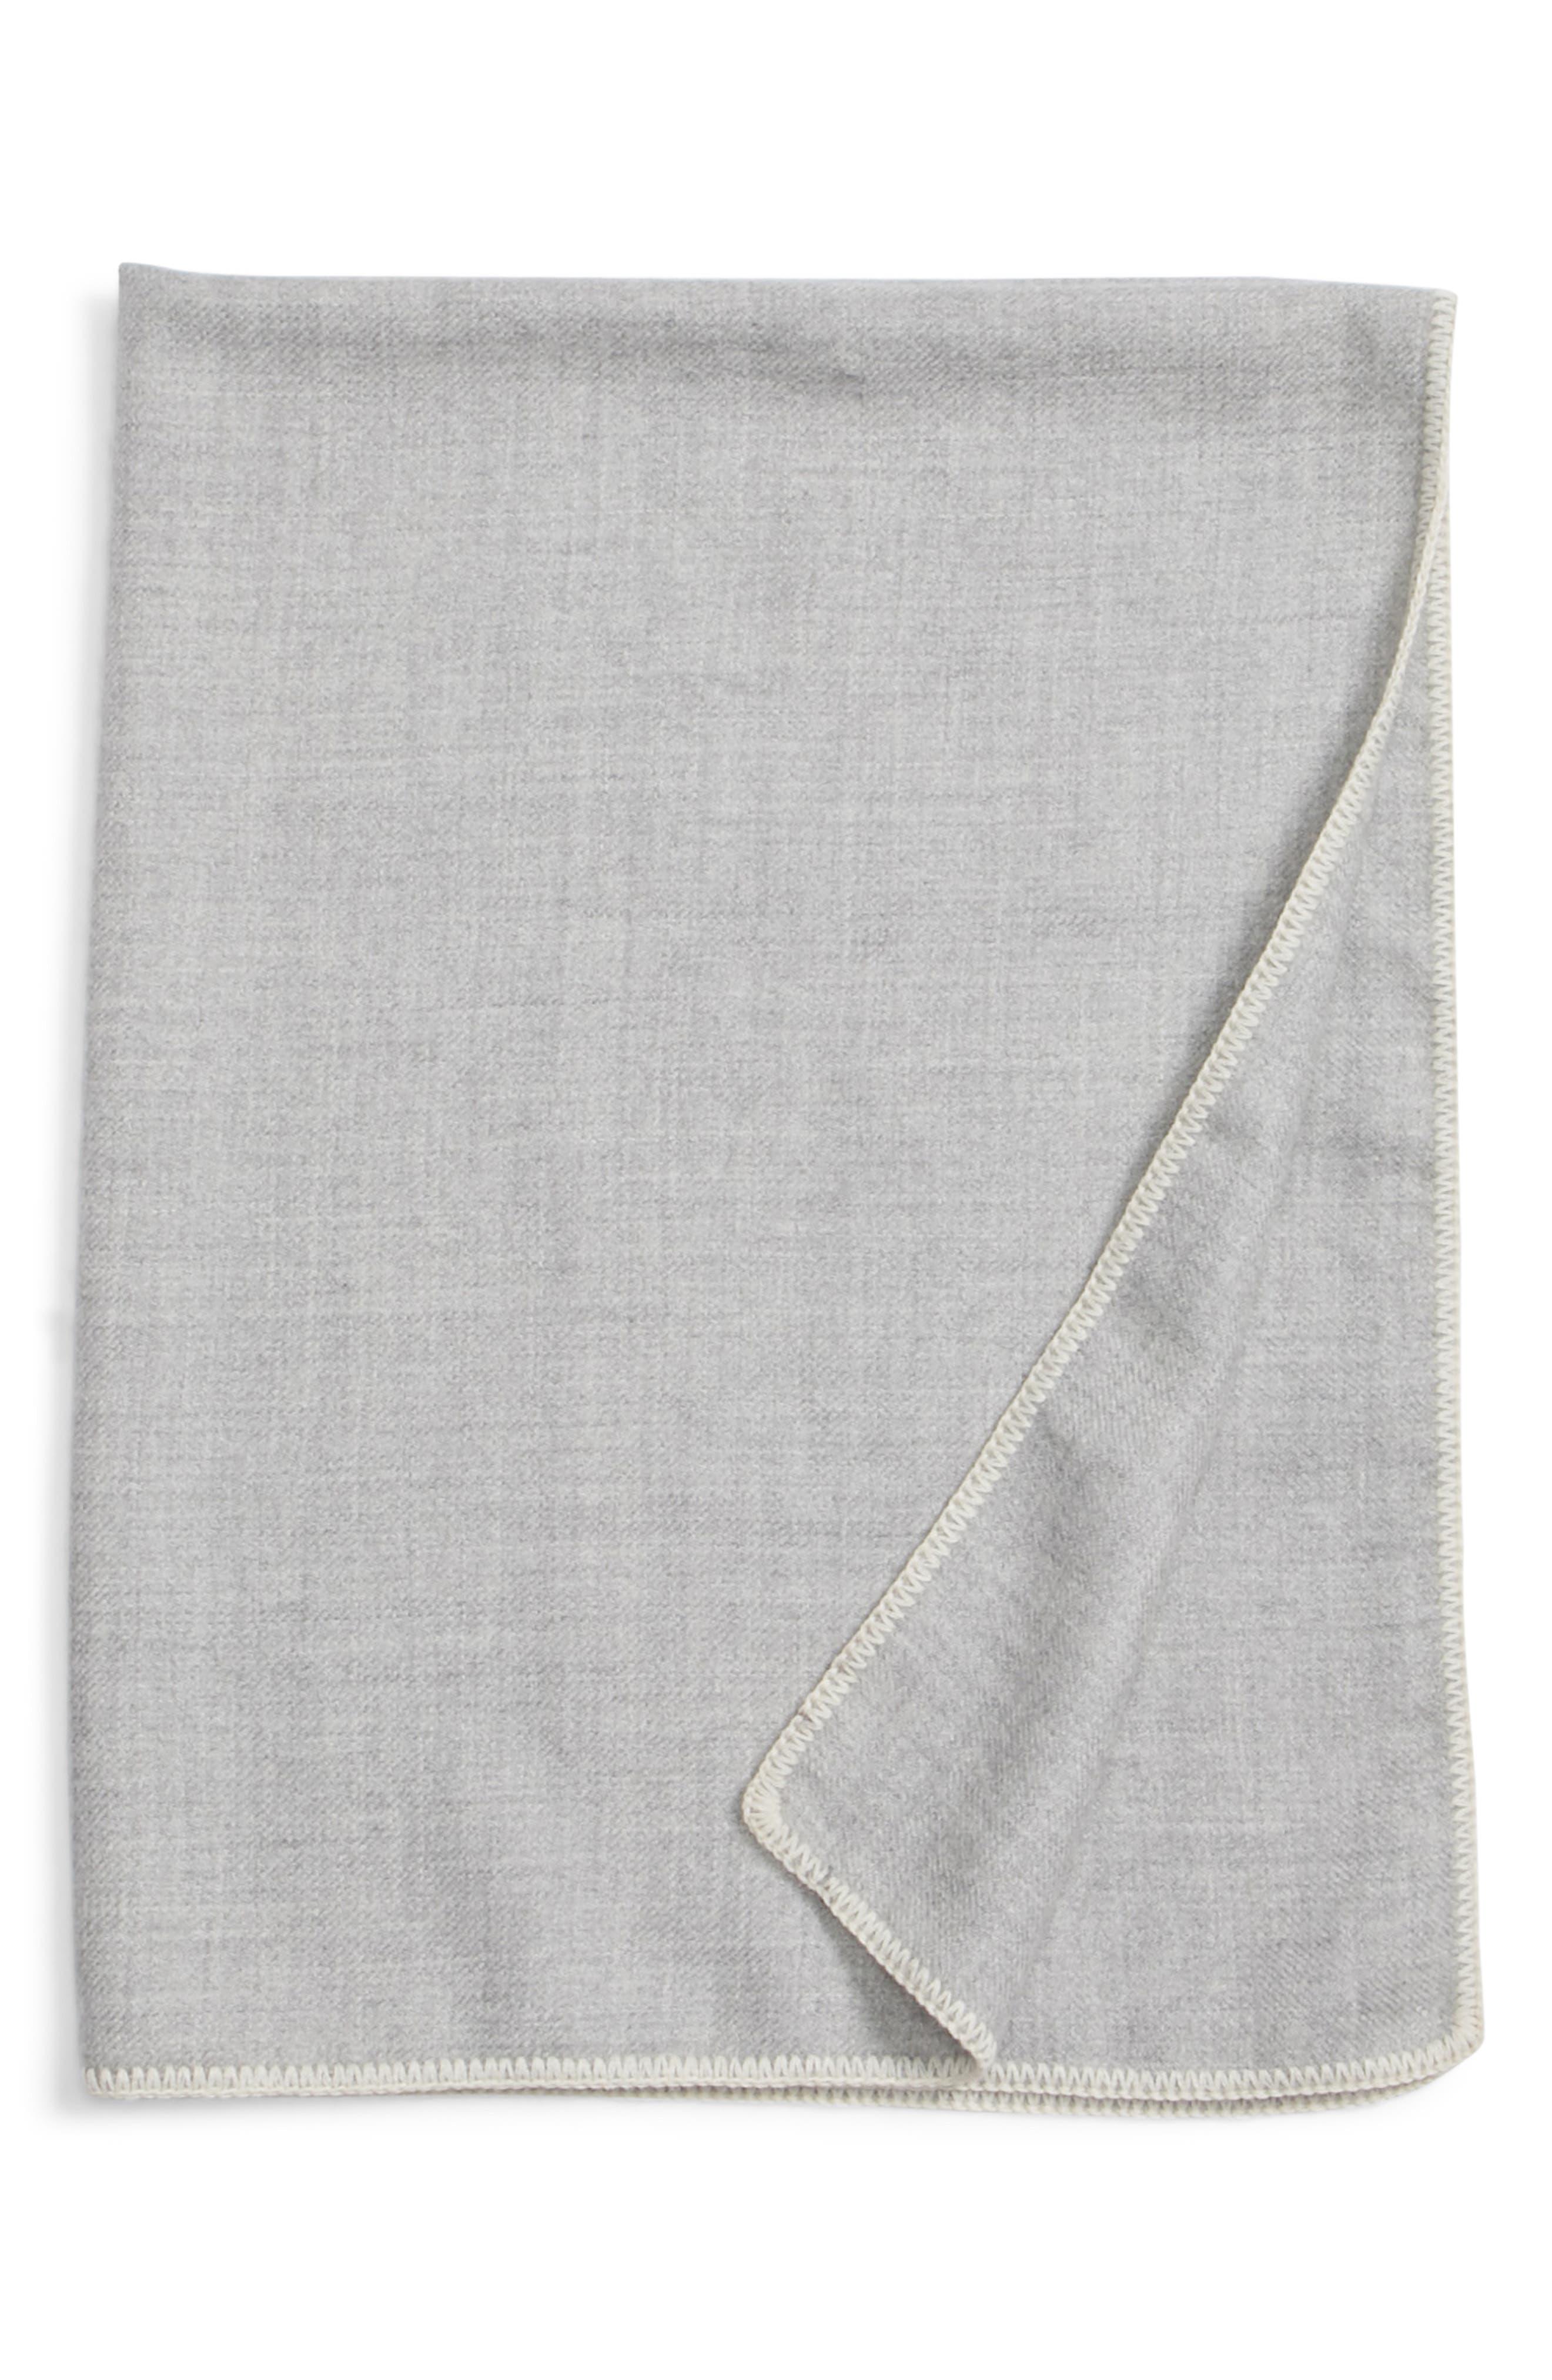 JENNI KAYNE,                             Baby Blanket,                             Main thumbnail 1, color,                             GREY/ IVORY